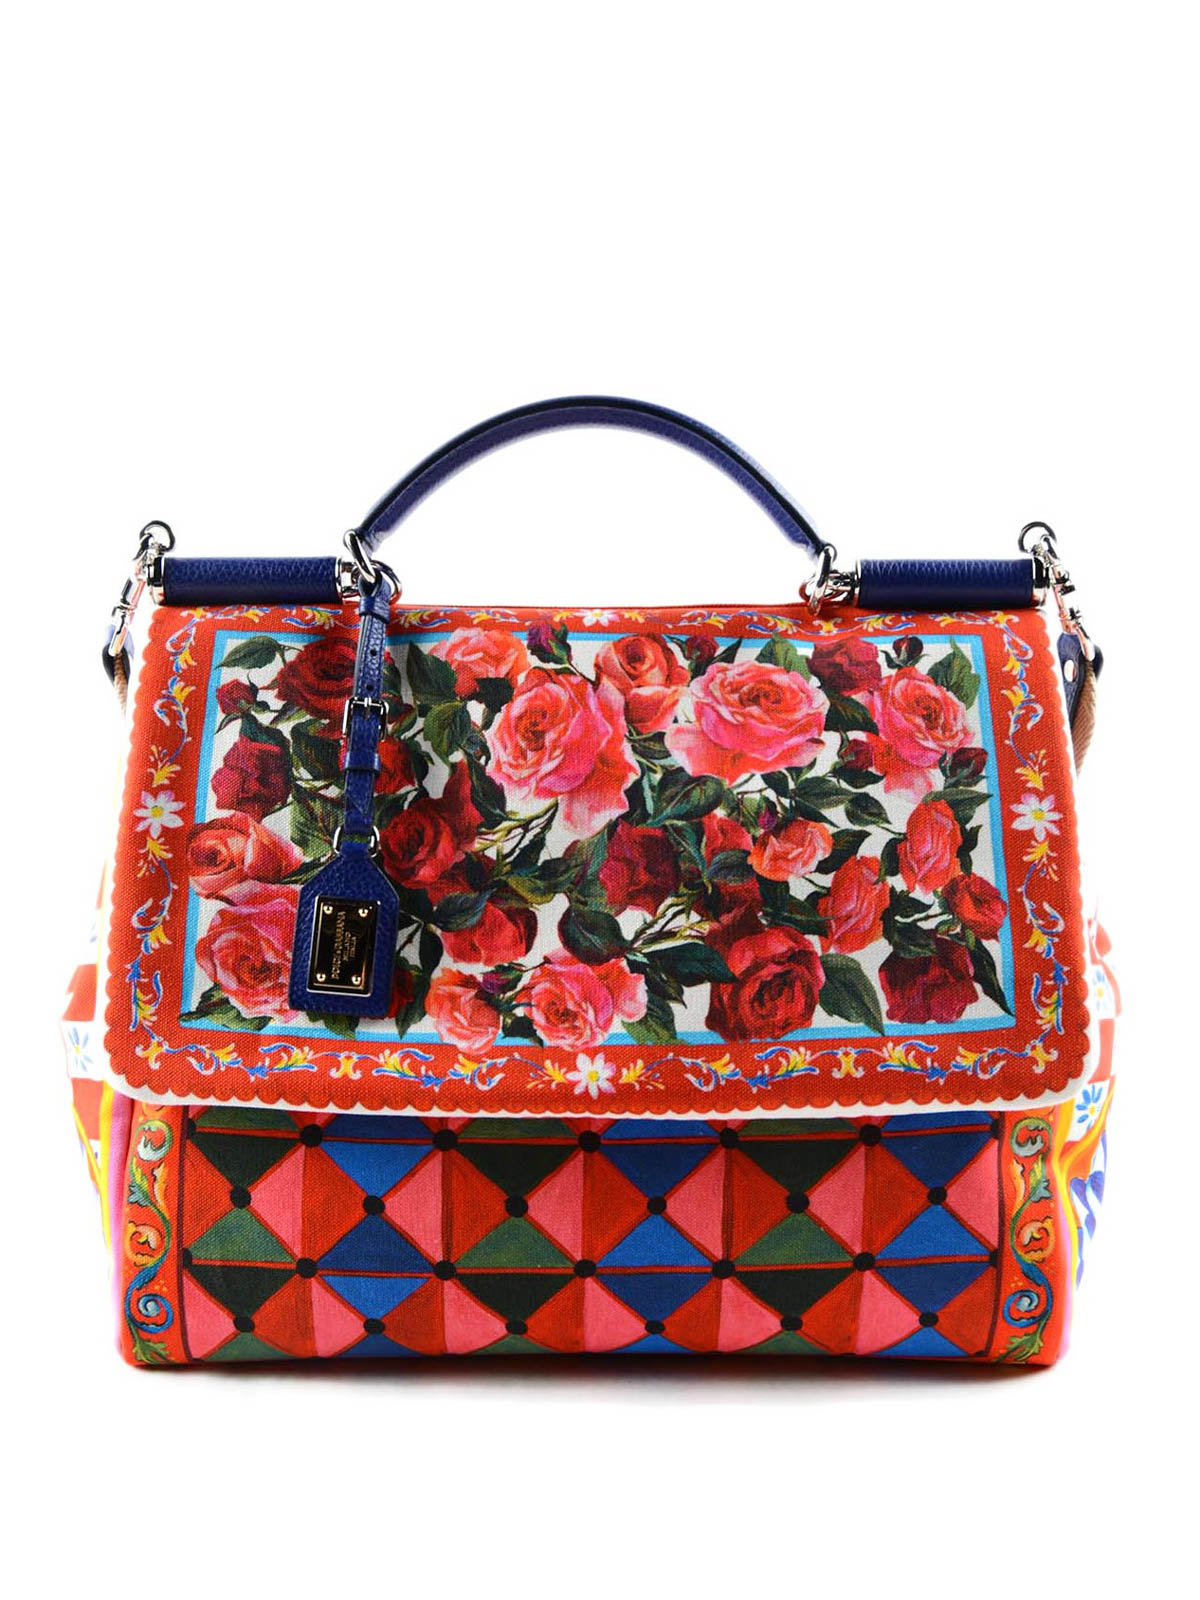 e7a329271cea Dolce   Gabbana - Borsa Sicily Soft stampa Mambo - bauletti ...